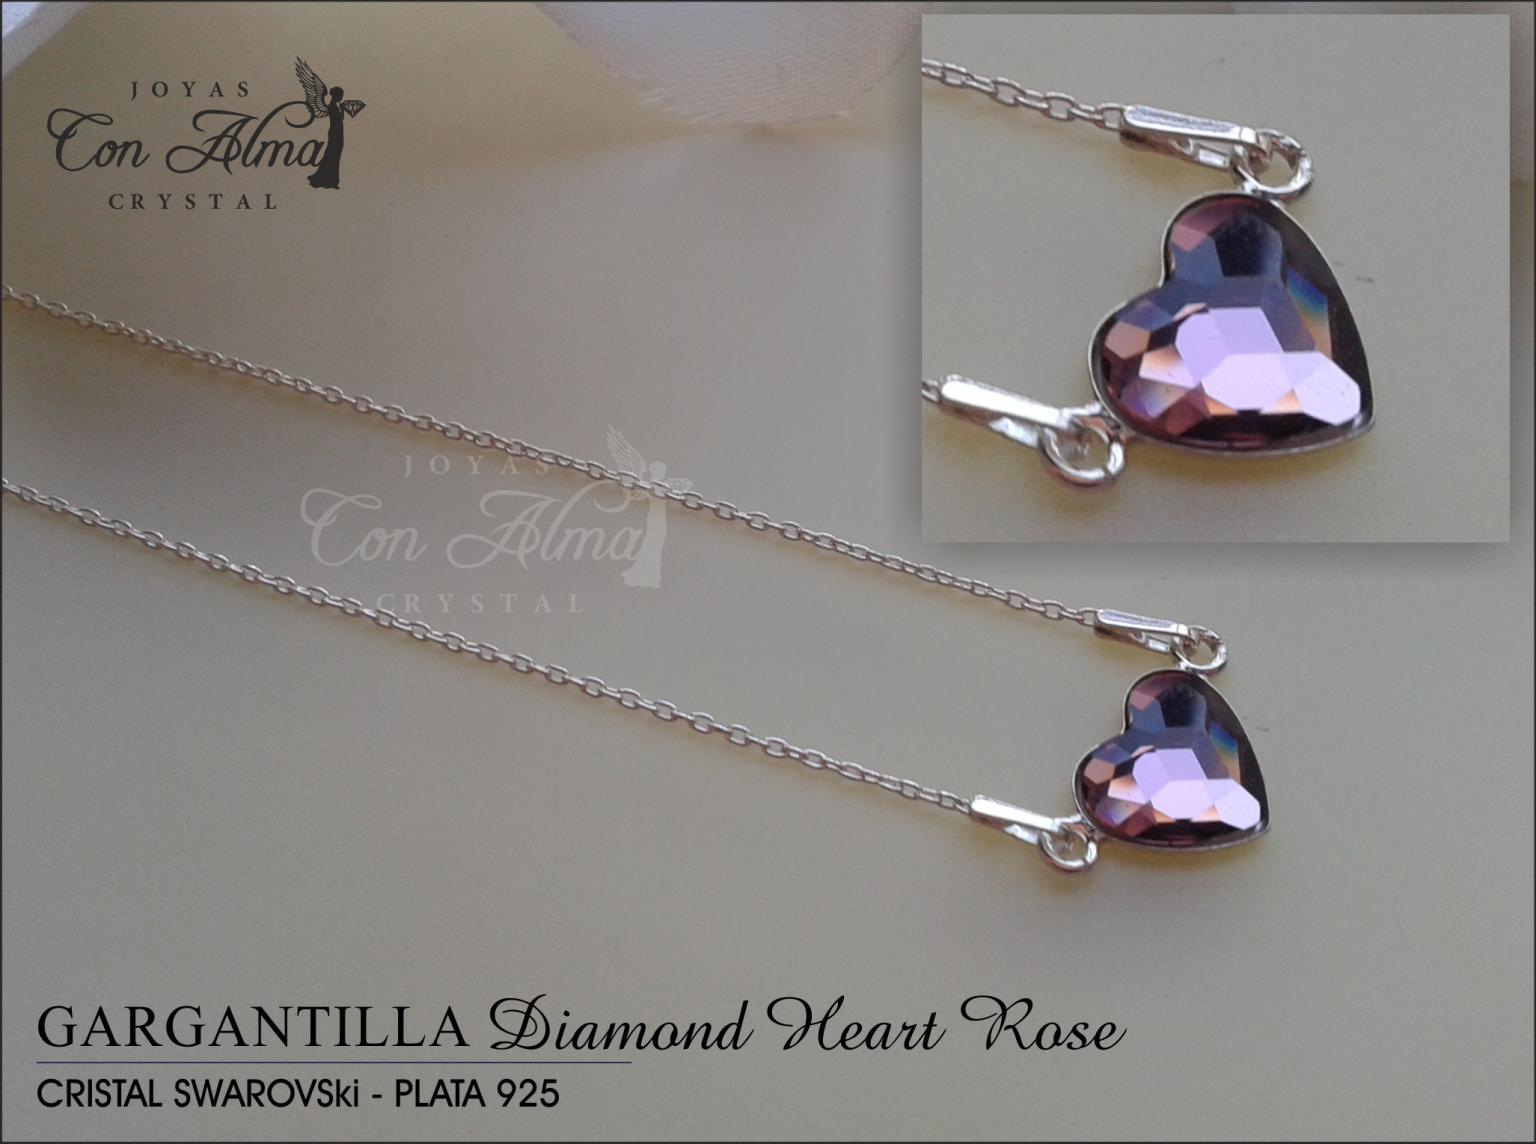 Gargantilla Diamond Rose 31,99 €